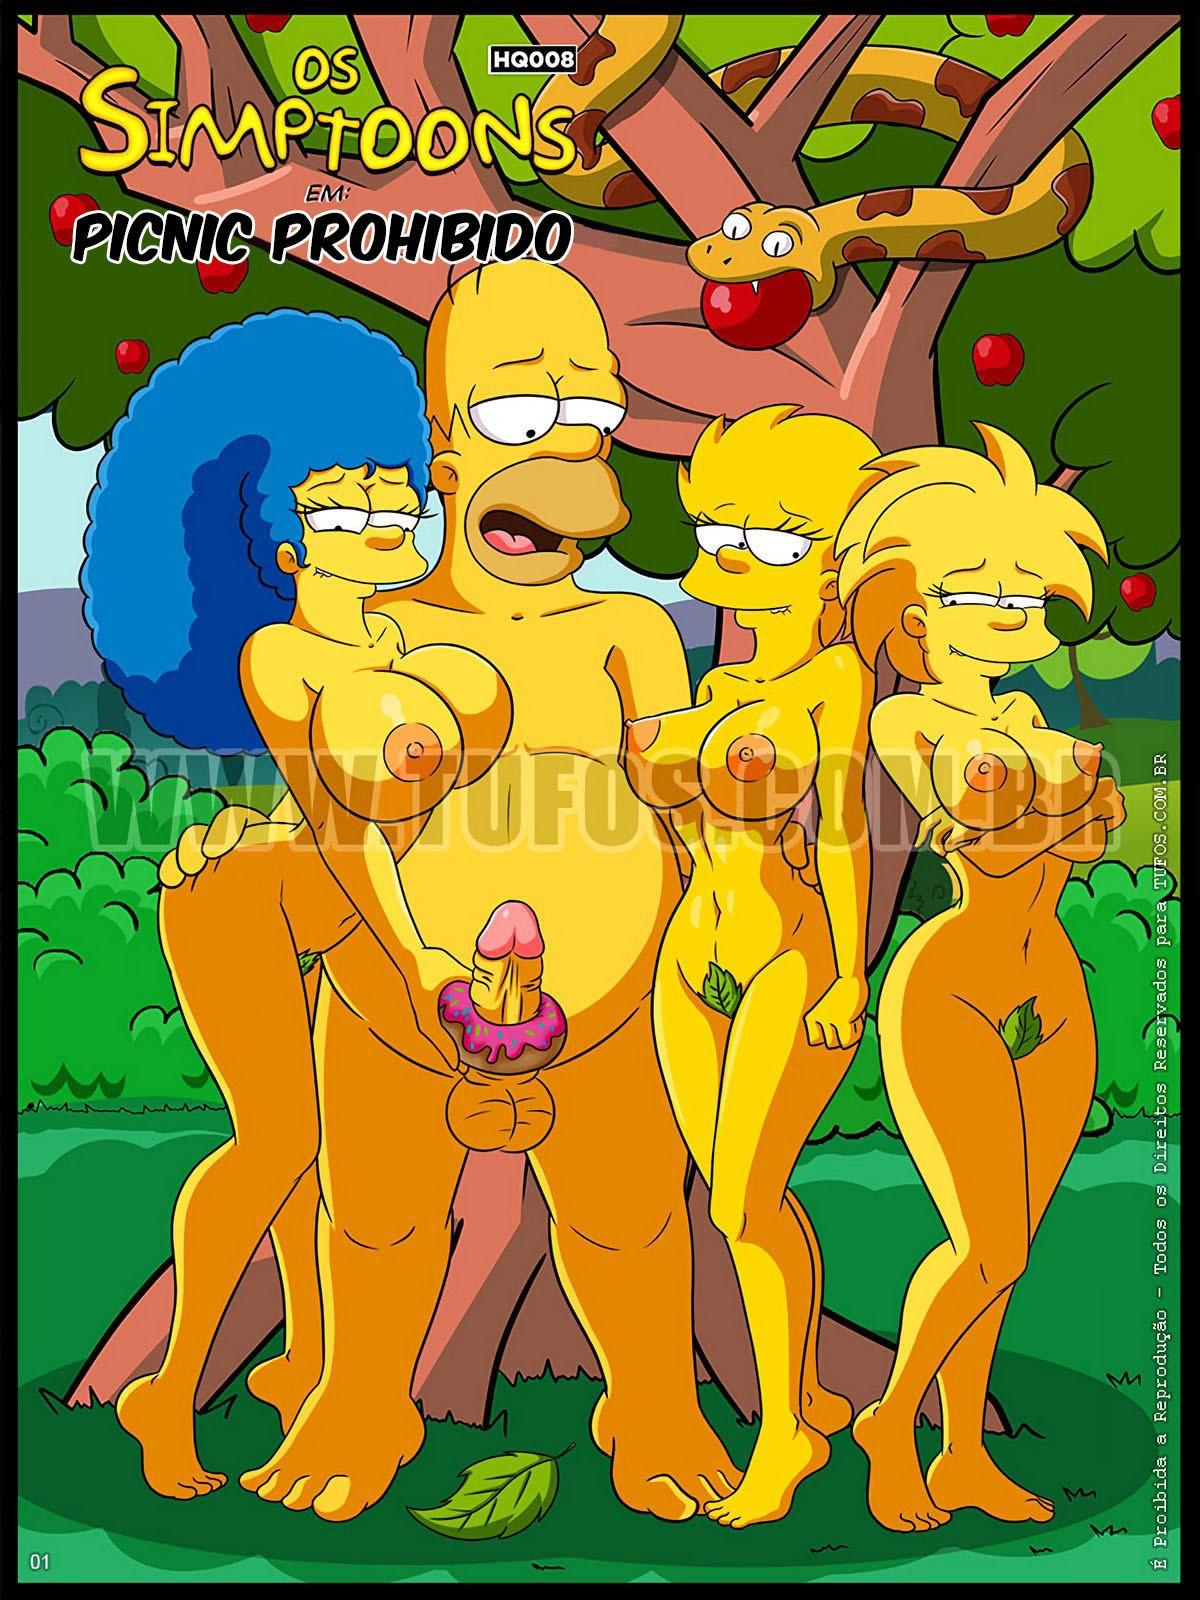 SureFap xxx porno The Simpsons - [Tufos] - Os Simptoons 008 - Piquenique Proibido